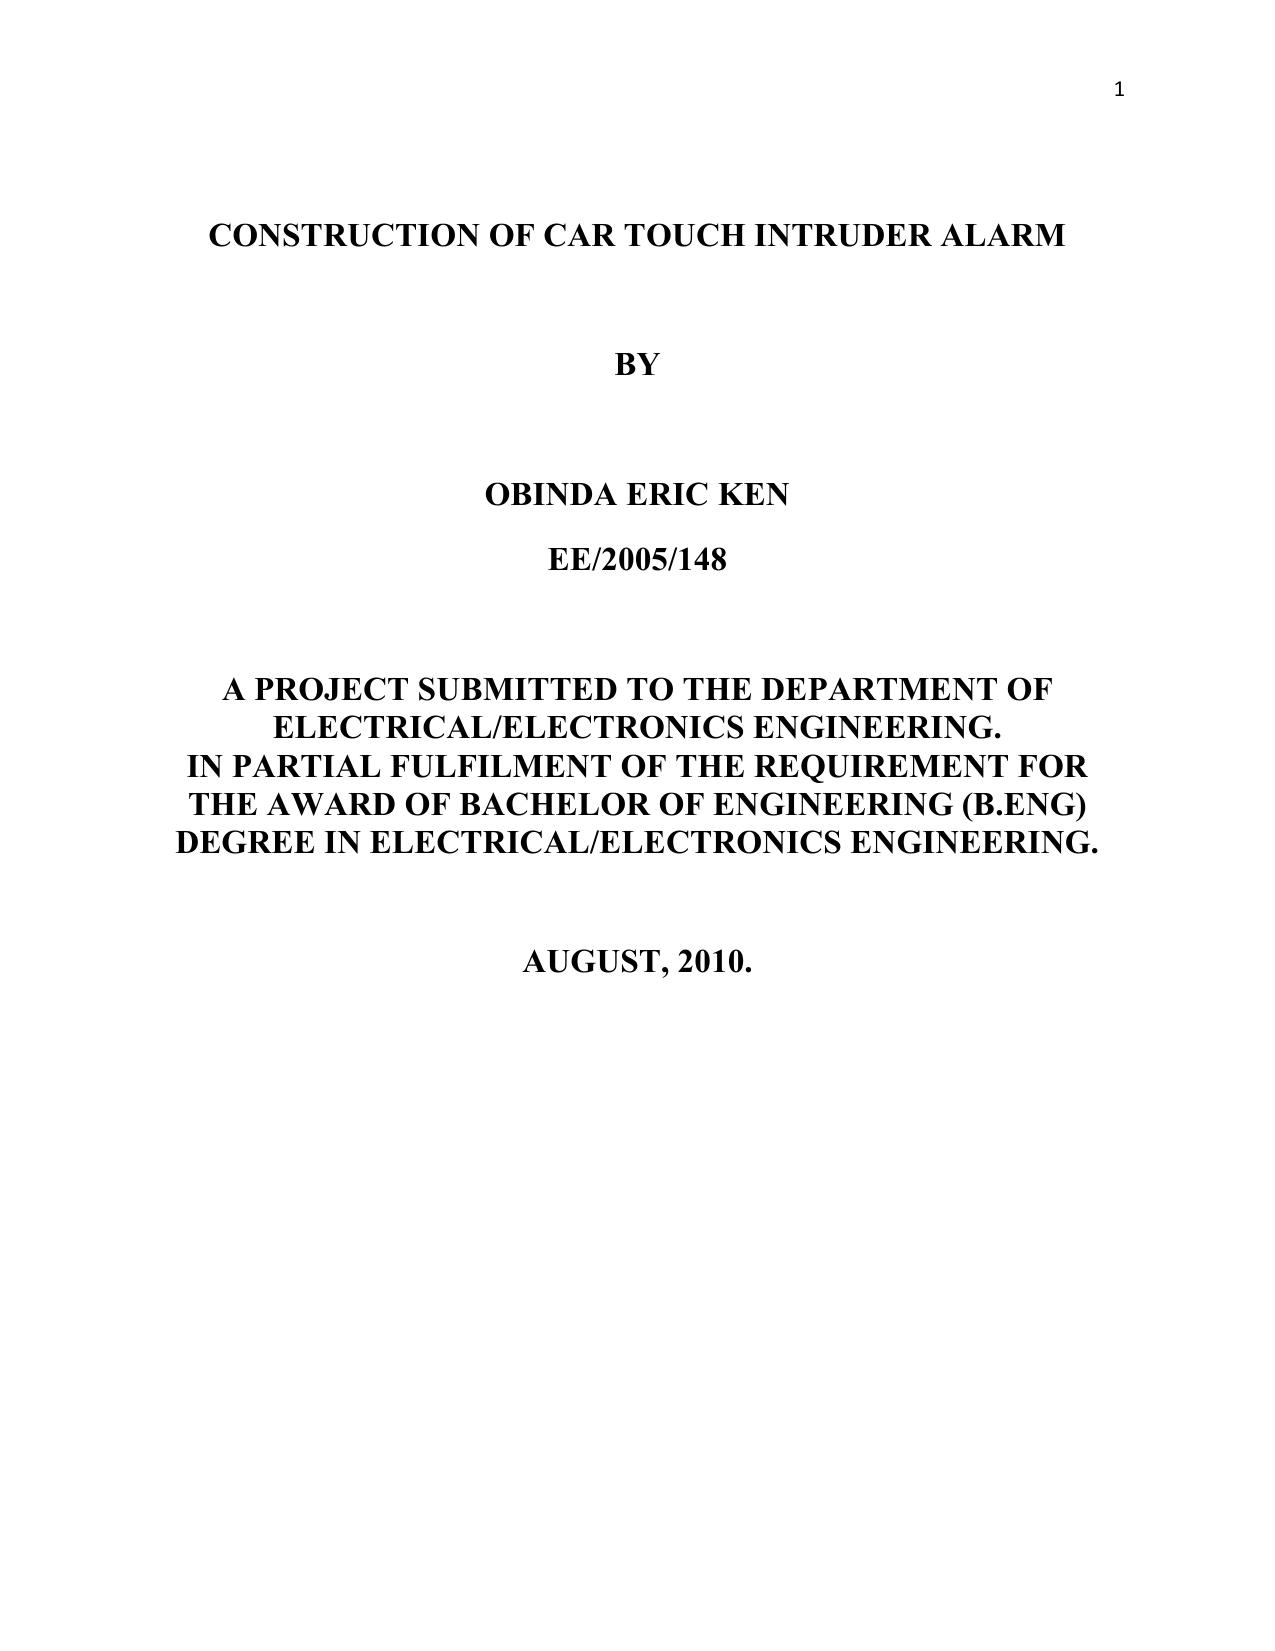 Construction Of Car Touch Intruder Alarm Multi Zone Transistor Circuit Schemati Diagram 008536342 1 165a418ae1cae178fc8f152a5c00adea